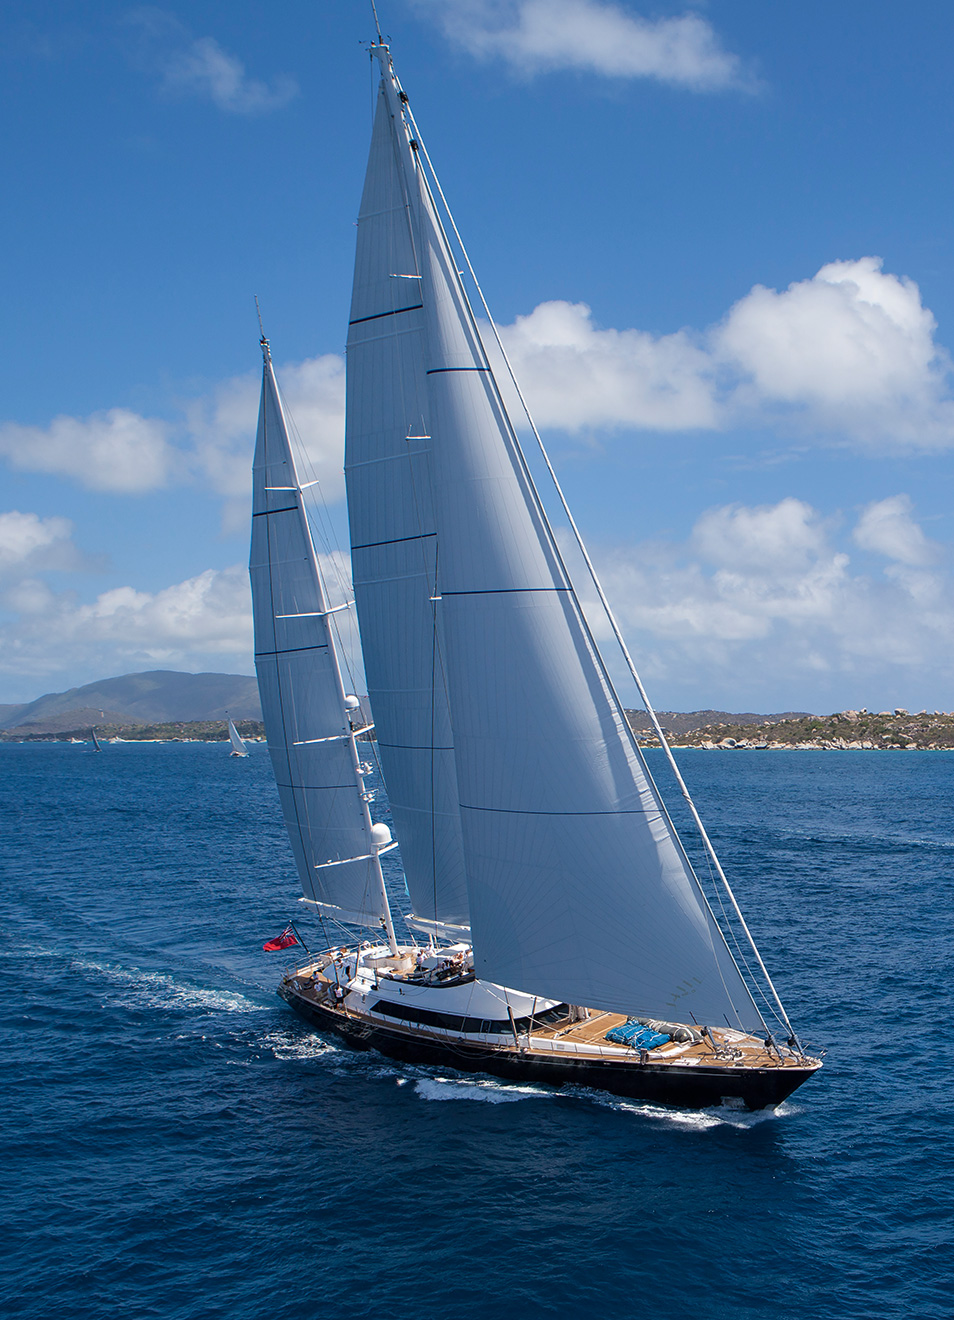 Sailing yacht Parsifal III